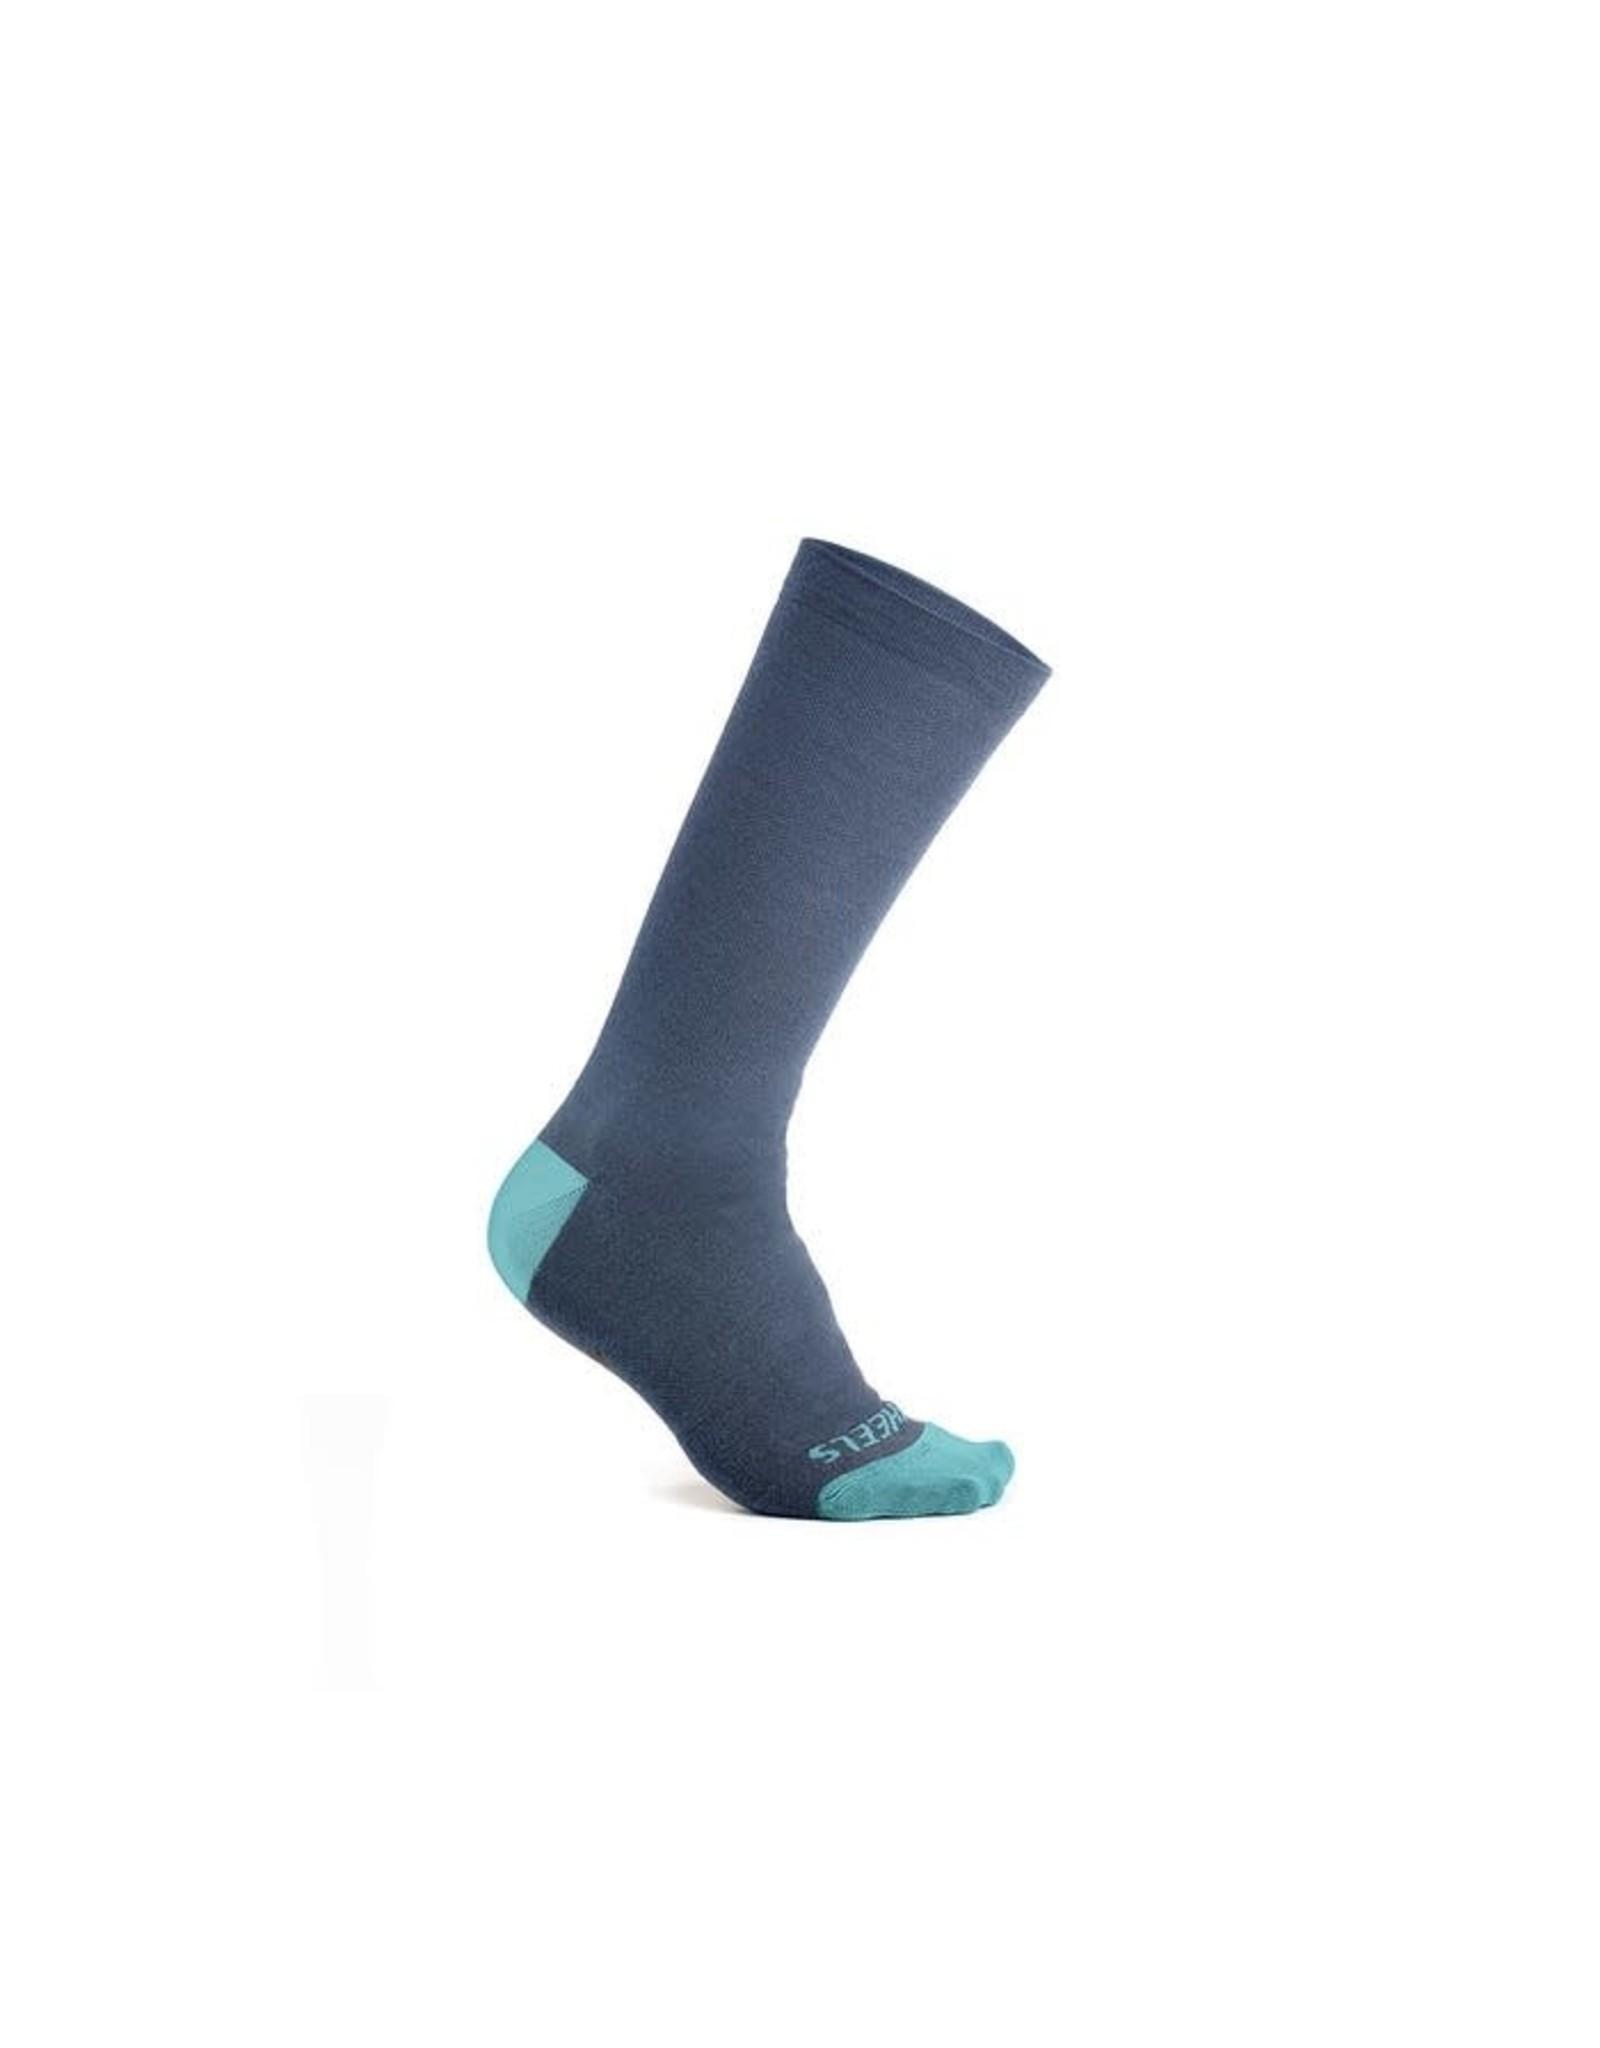 7MESH 7MESH - Ashlu Cadet Blue Merino Sock Lrg